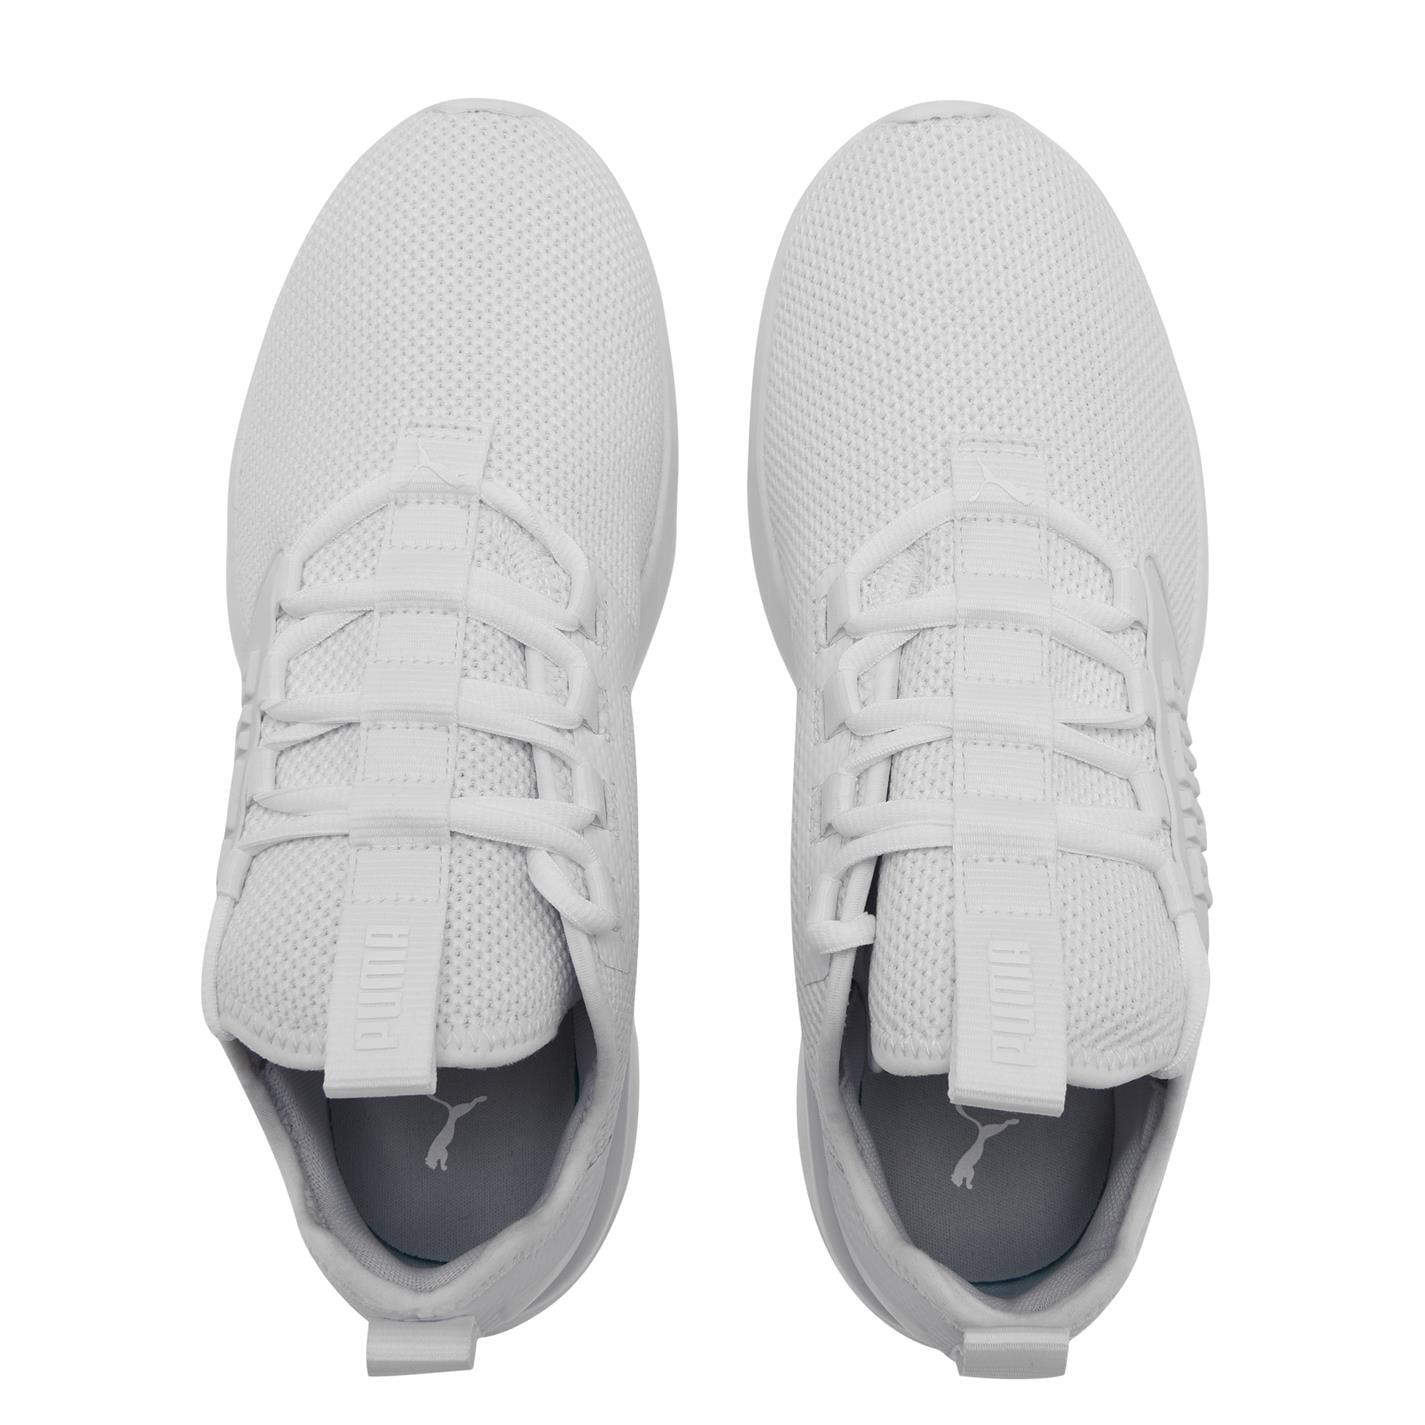 Adidasi sport Puma Retaliate pentru Barbati triple alb